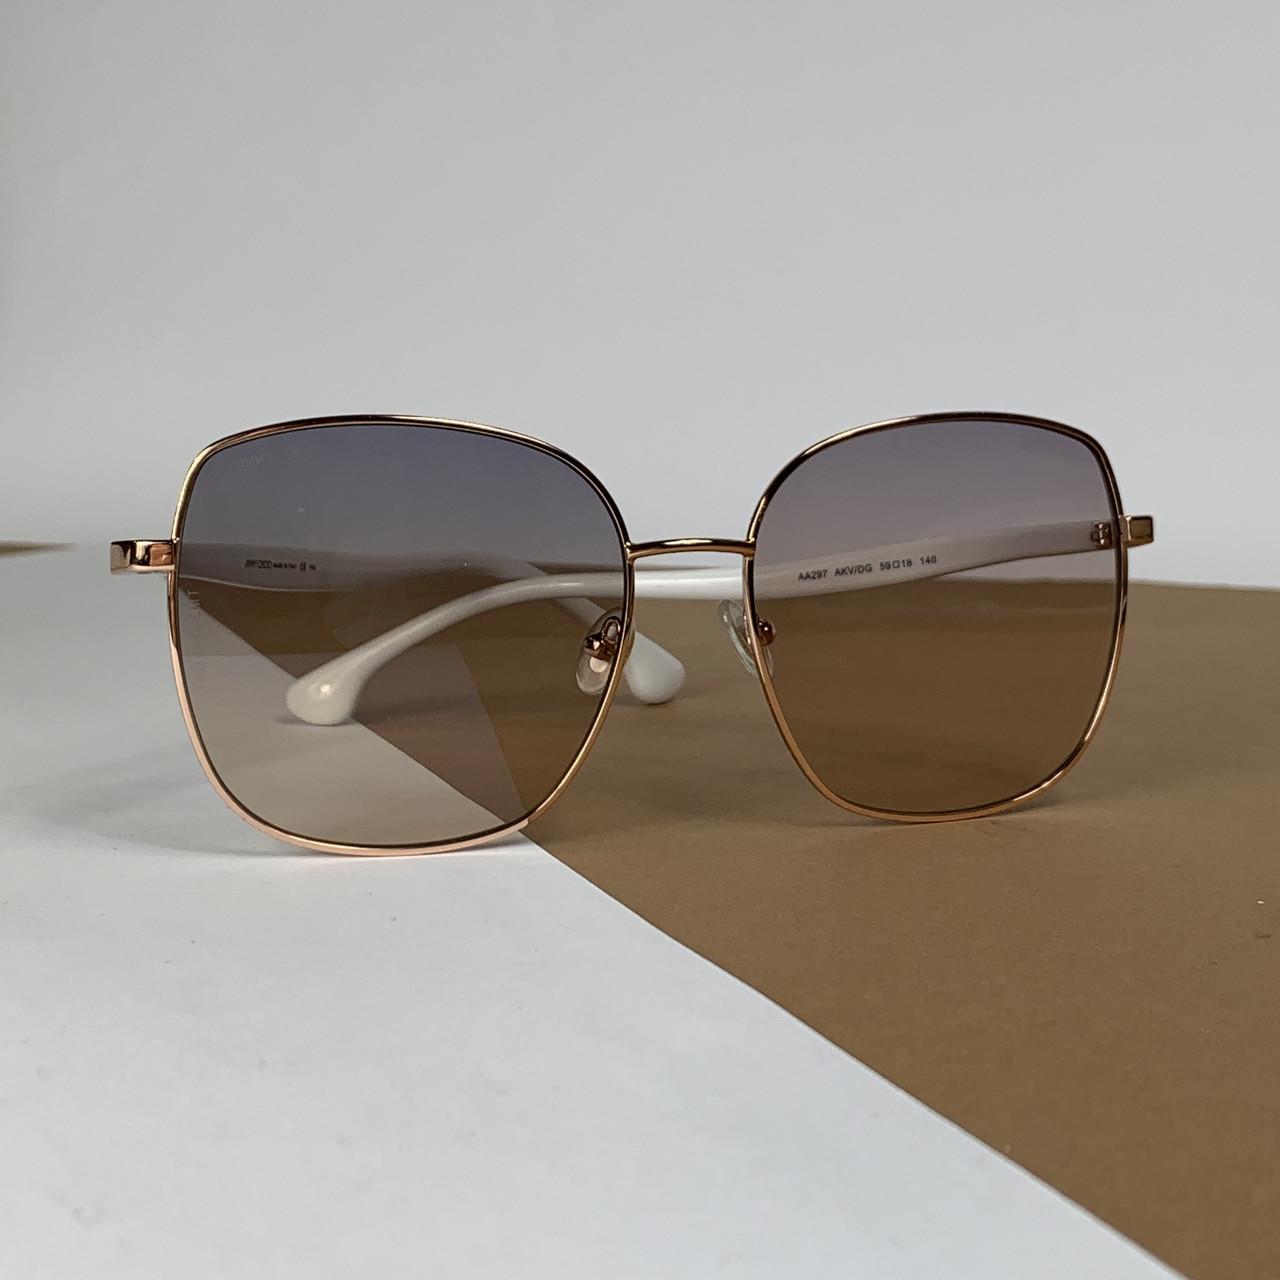 Очки солнцезащитные женские Jimmy Choo 106-57